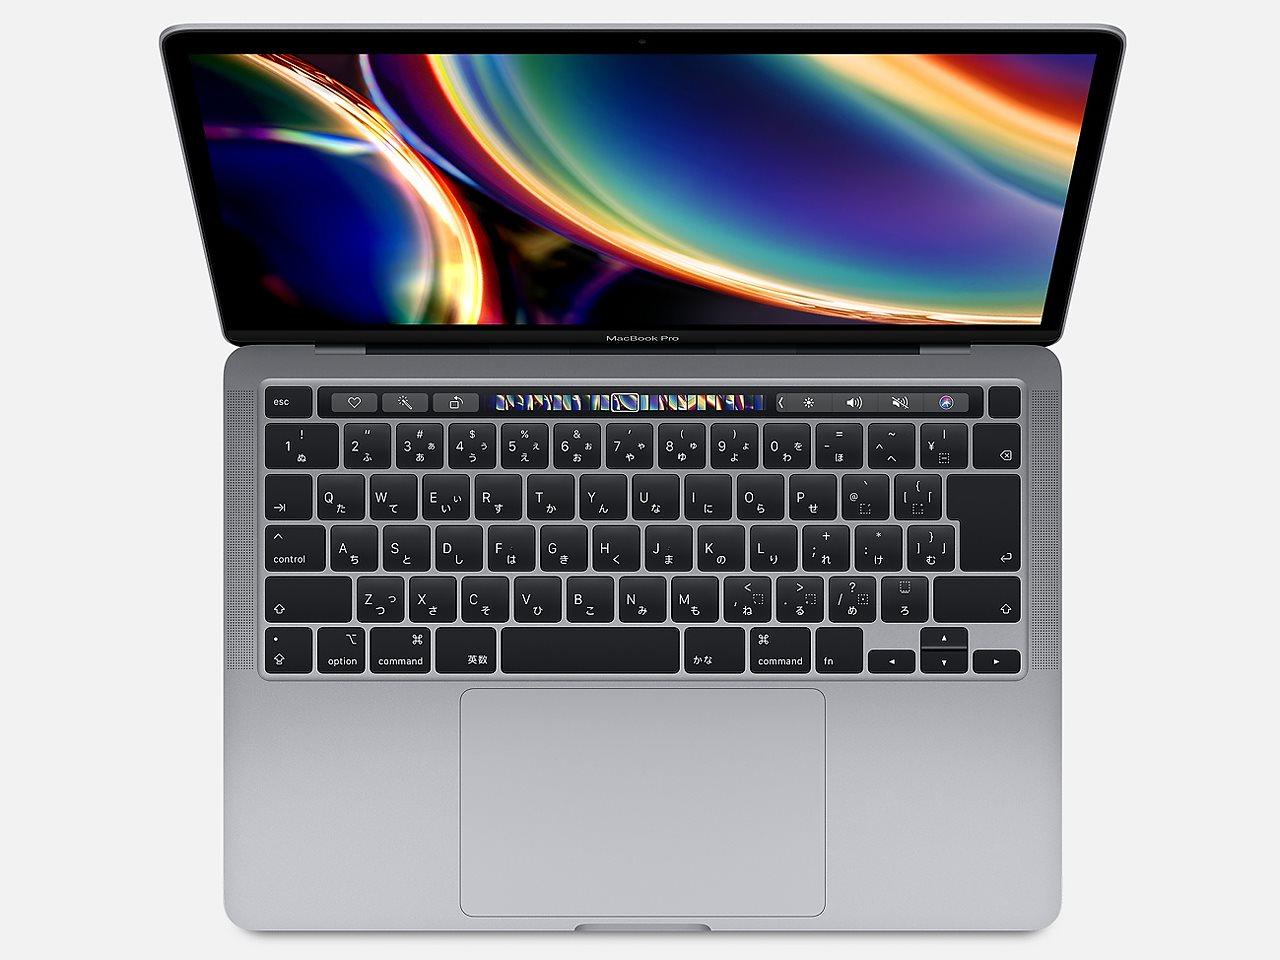 Apple MacBook Pro Retinaディスプレイ 1400/13.3 MXK52J/A [スペースグレイ] 13インチ 第8世代 1.4GHz Intel Core i5 512GB